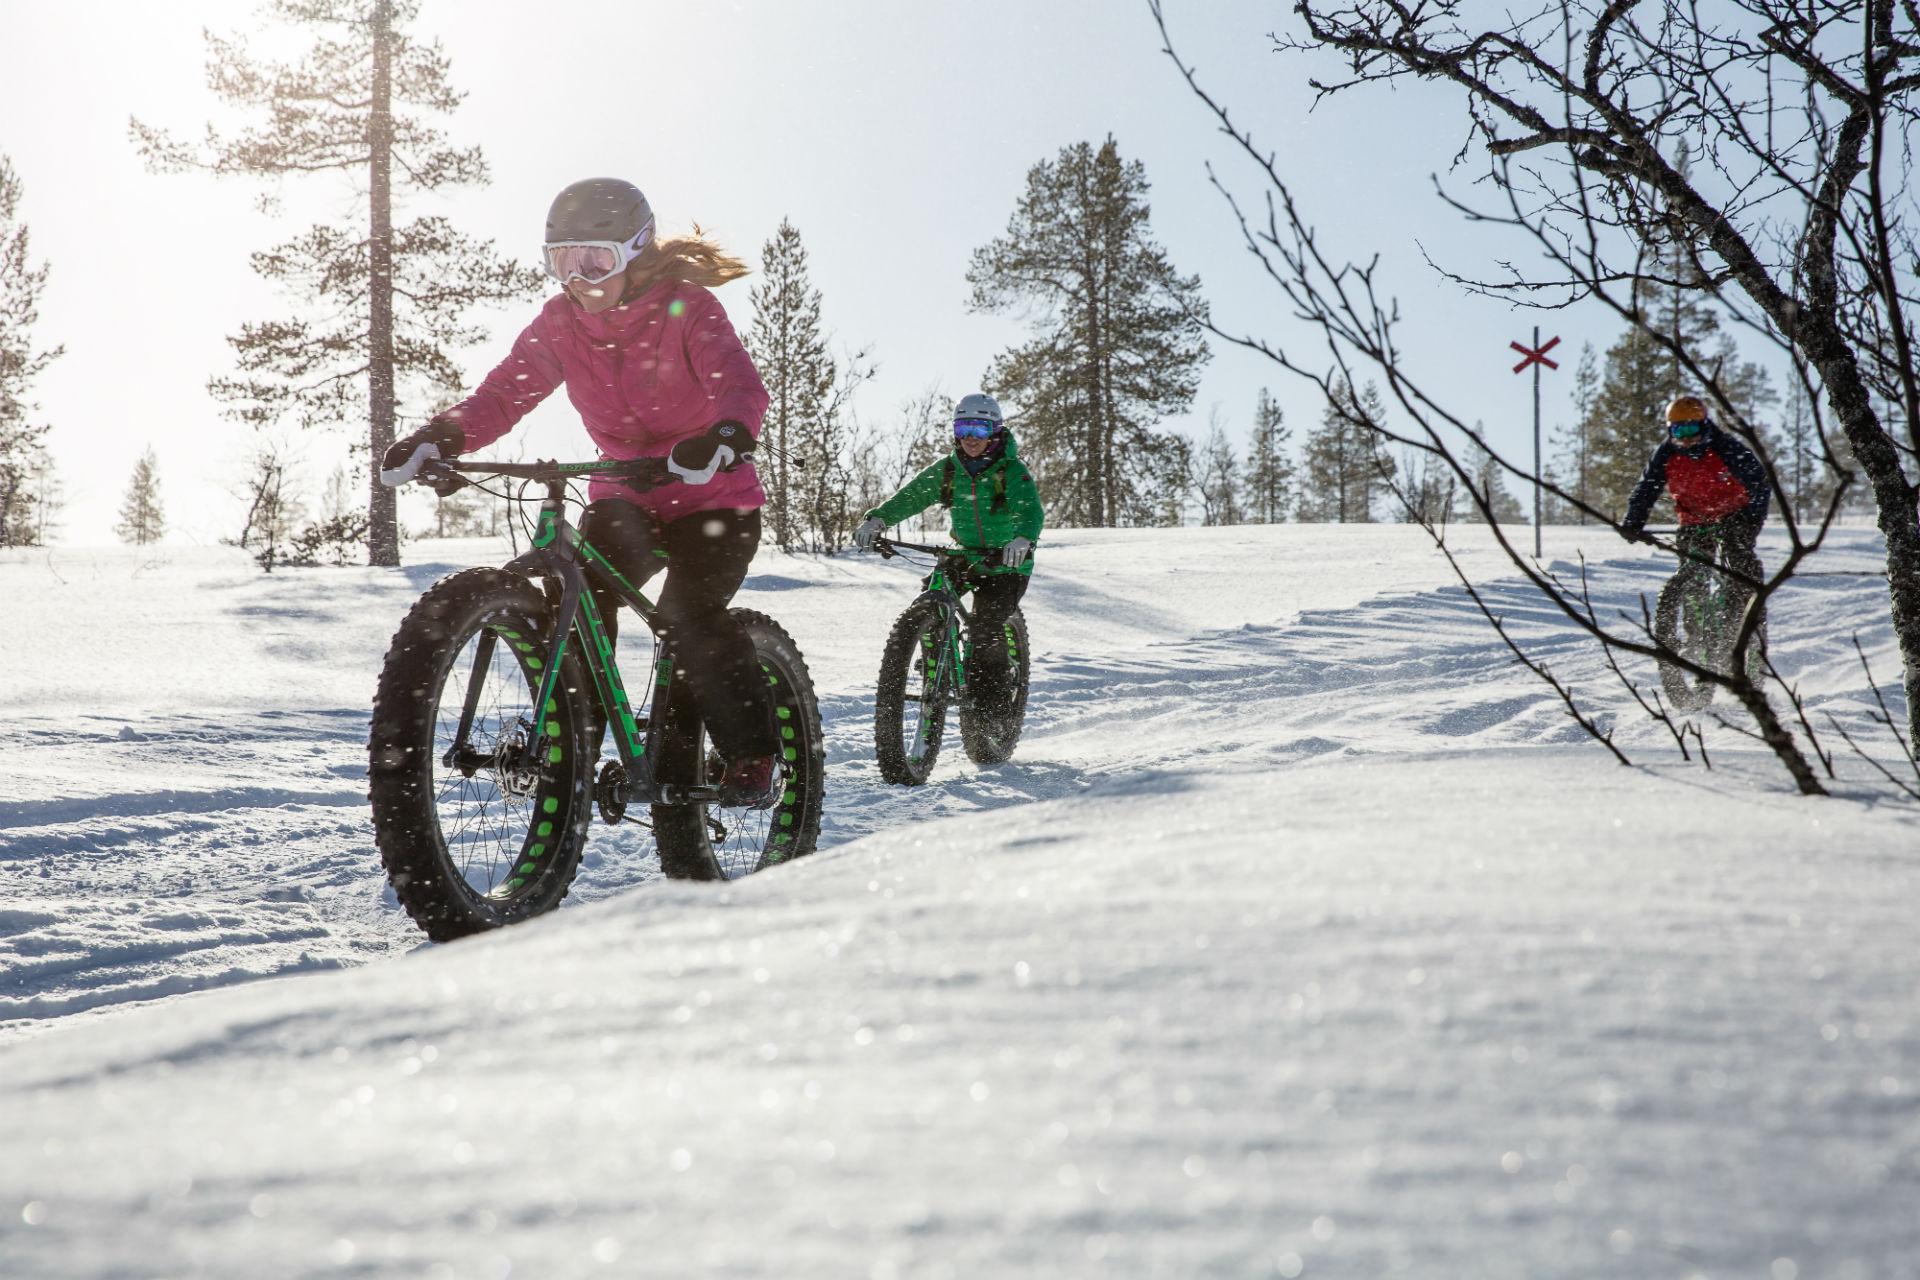 Wintercycling fatbikes Lofsdalen, AdventureSweden.